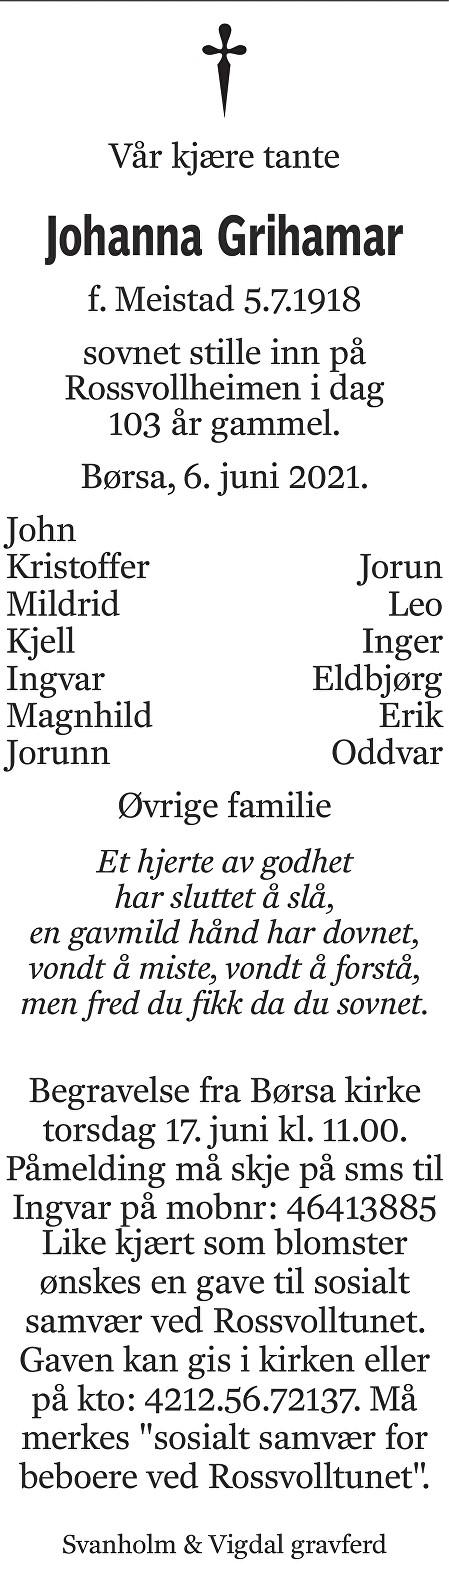 Johanna Grihamar Dødsannonse